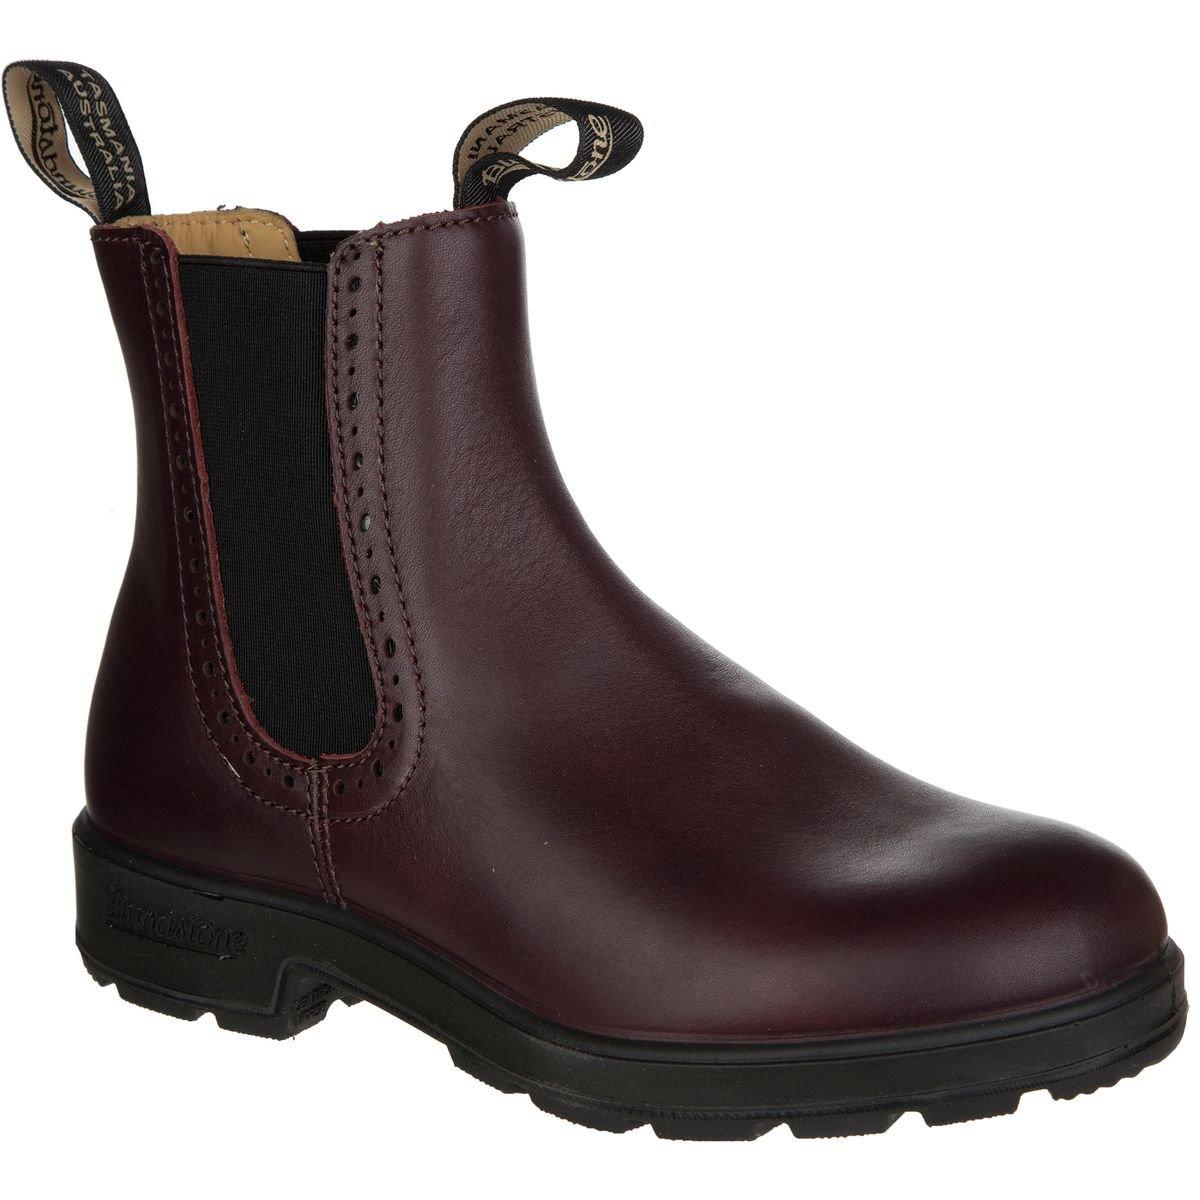 Blundstone Women's 1352 Chelsea Boot, Shiraz, 5 UK/8 M US